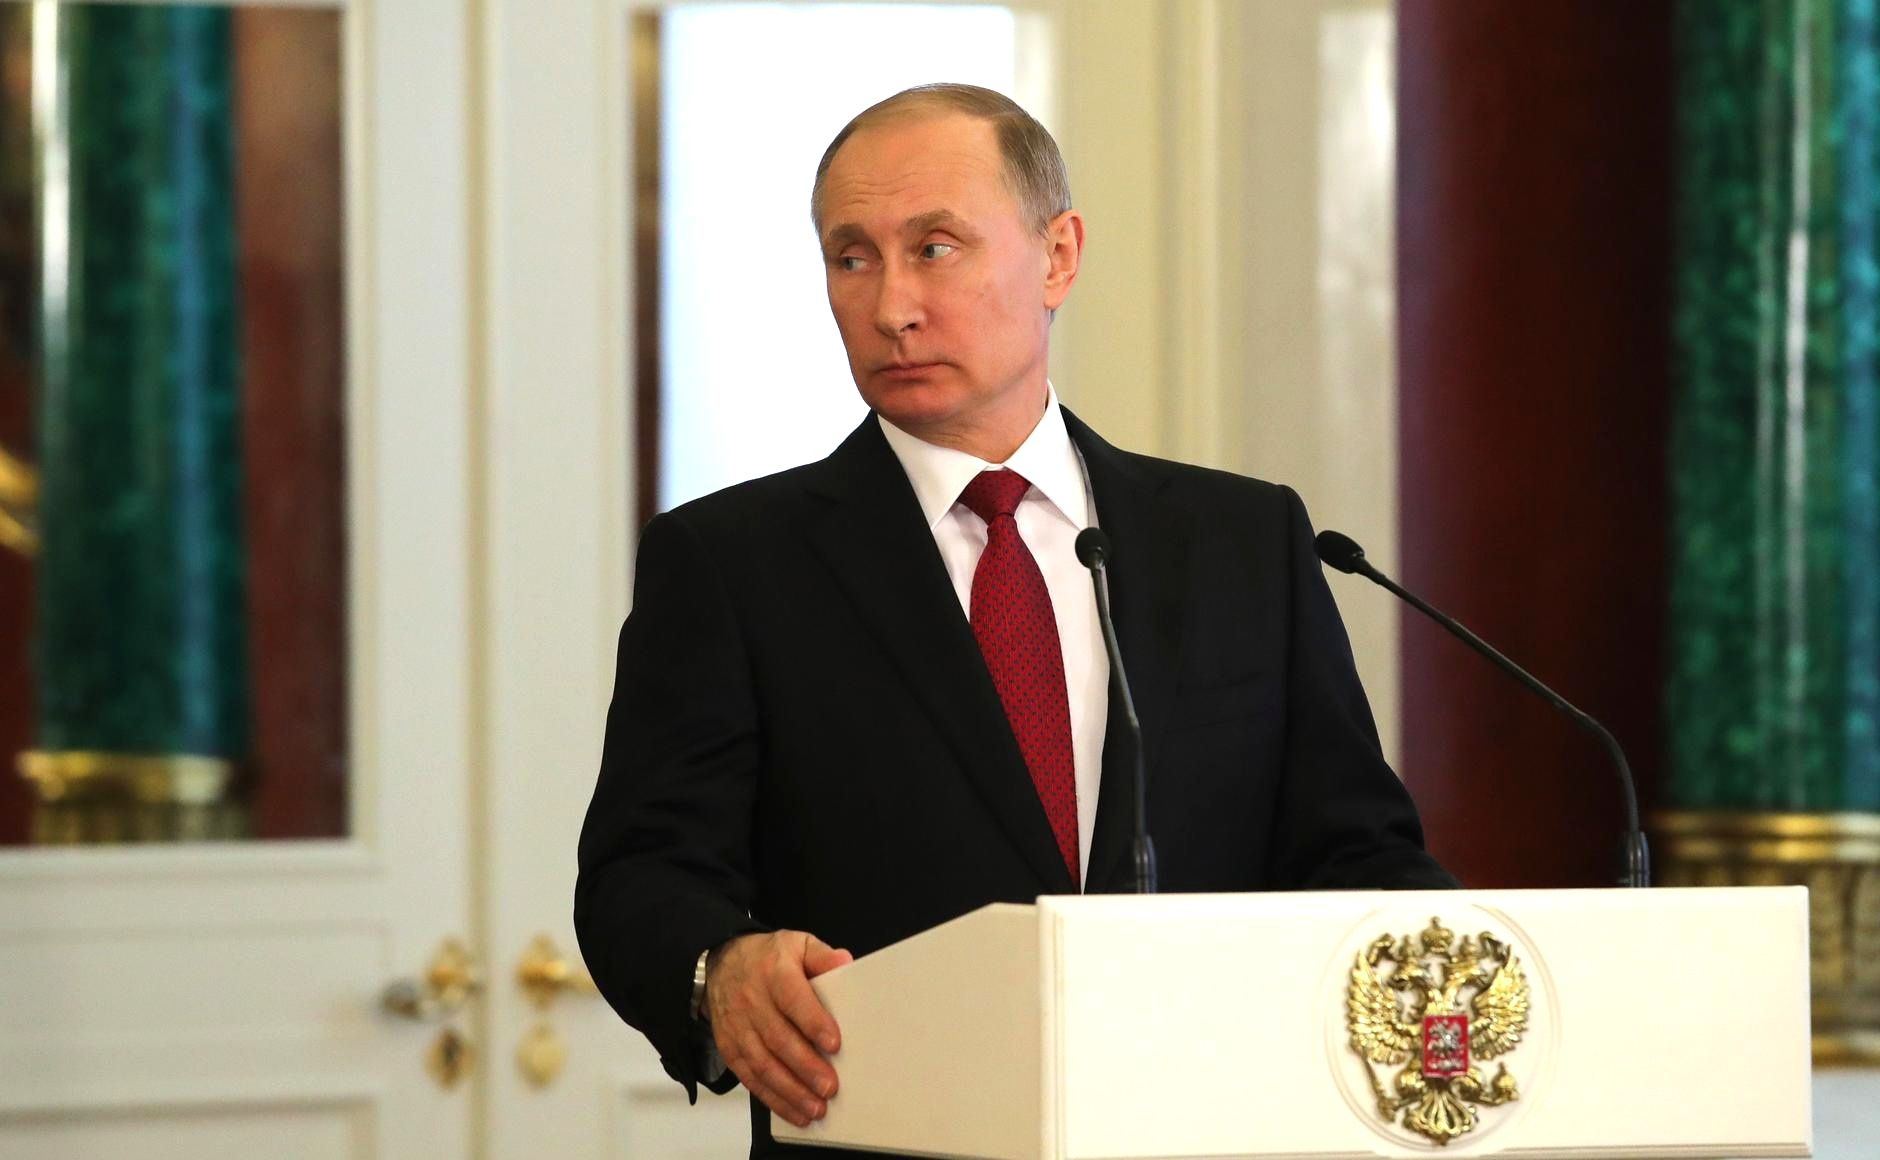 Больше половины россиян хотят переизбрания Владимира Путина напост президента